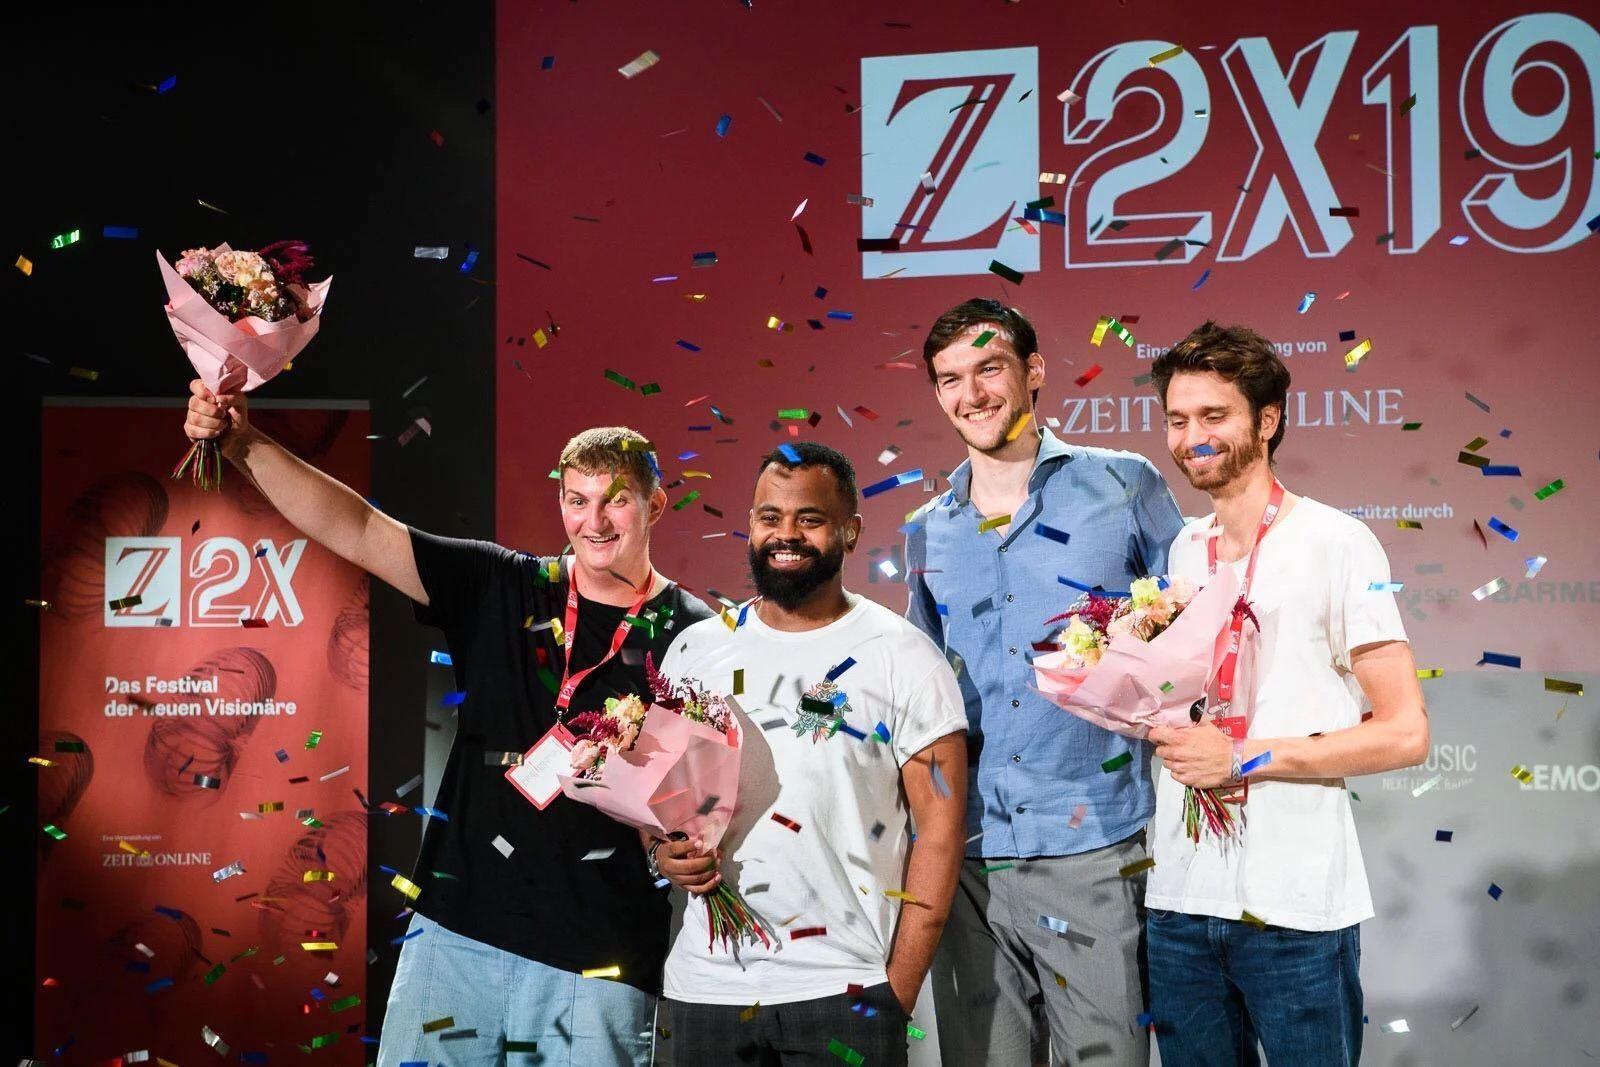 Z2x festival 2019 gewinner bild